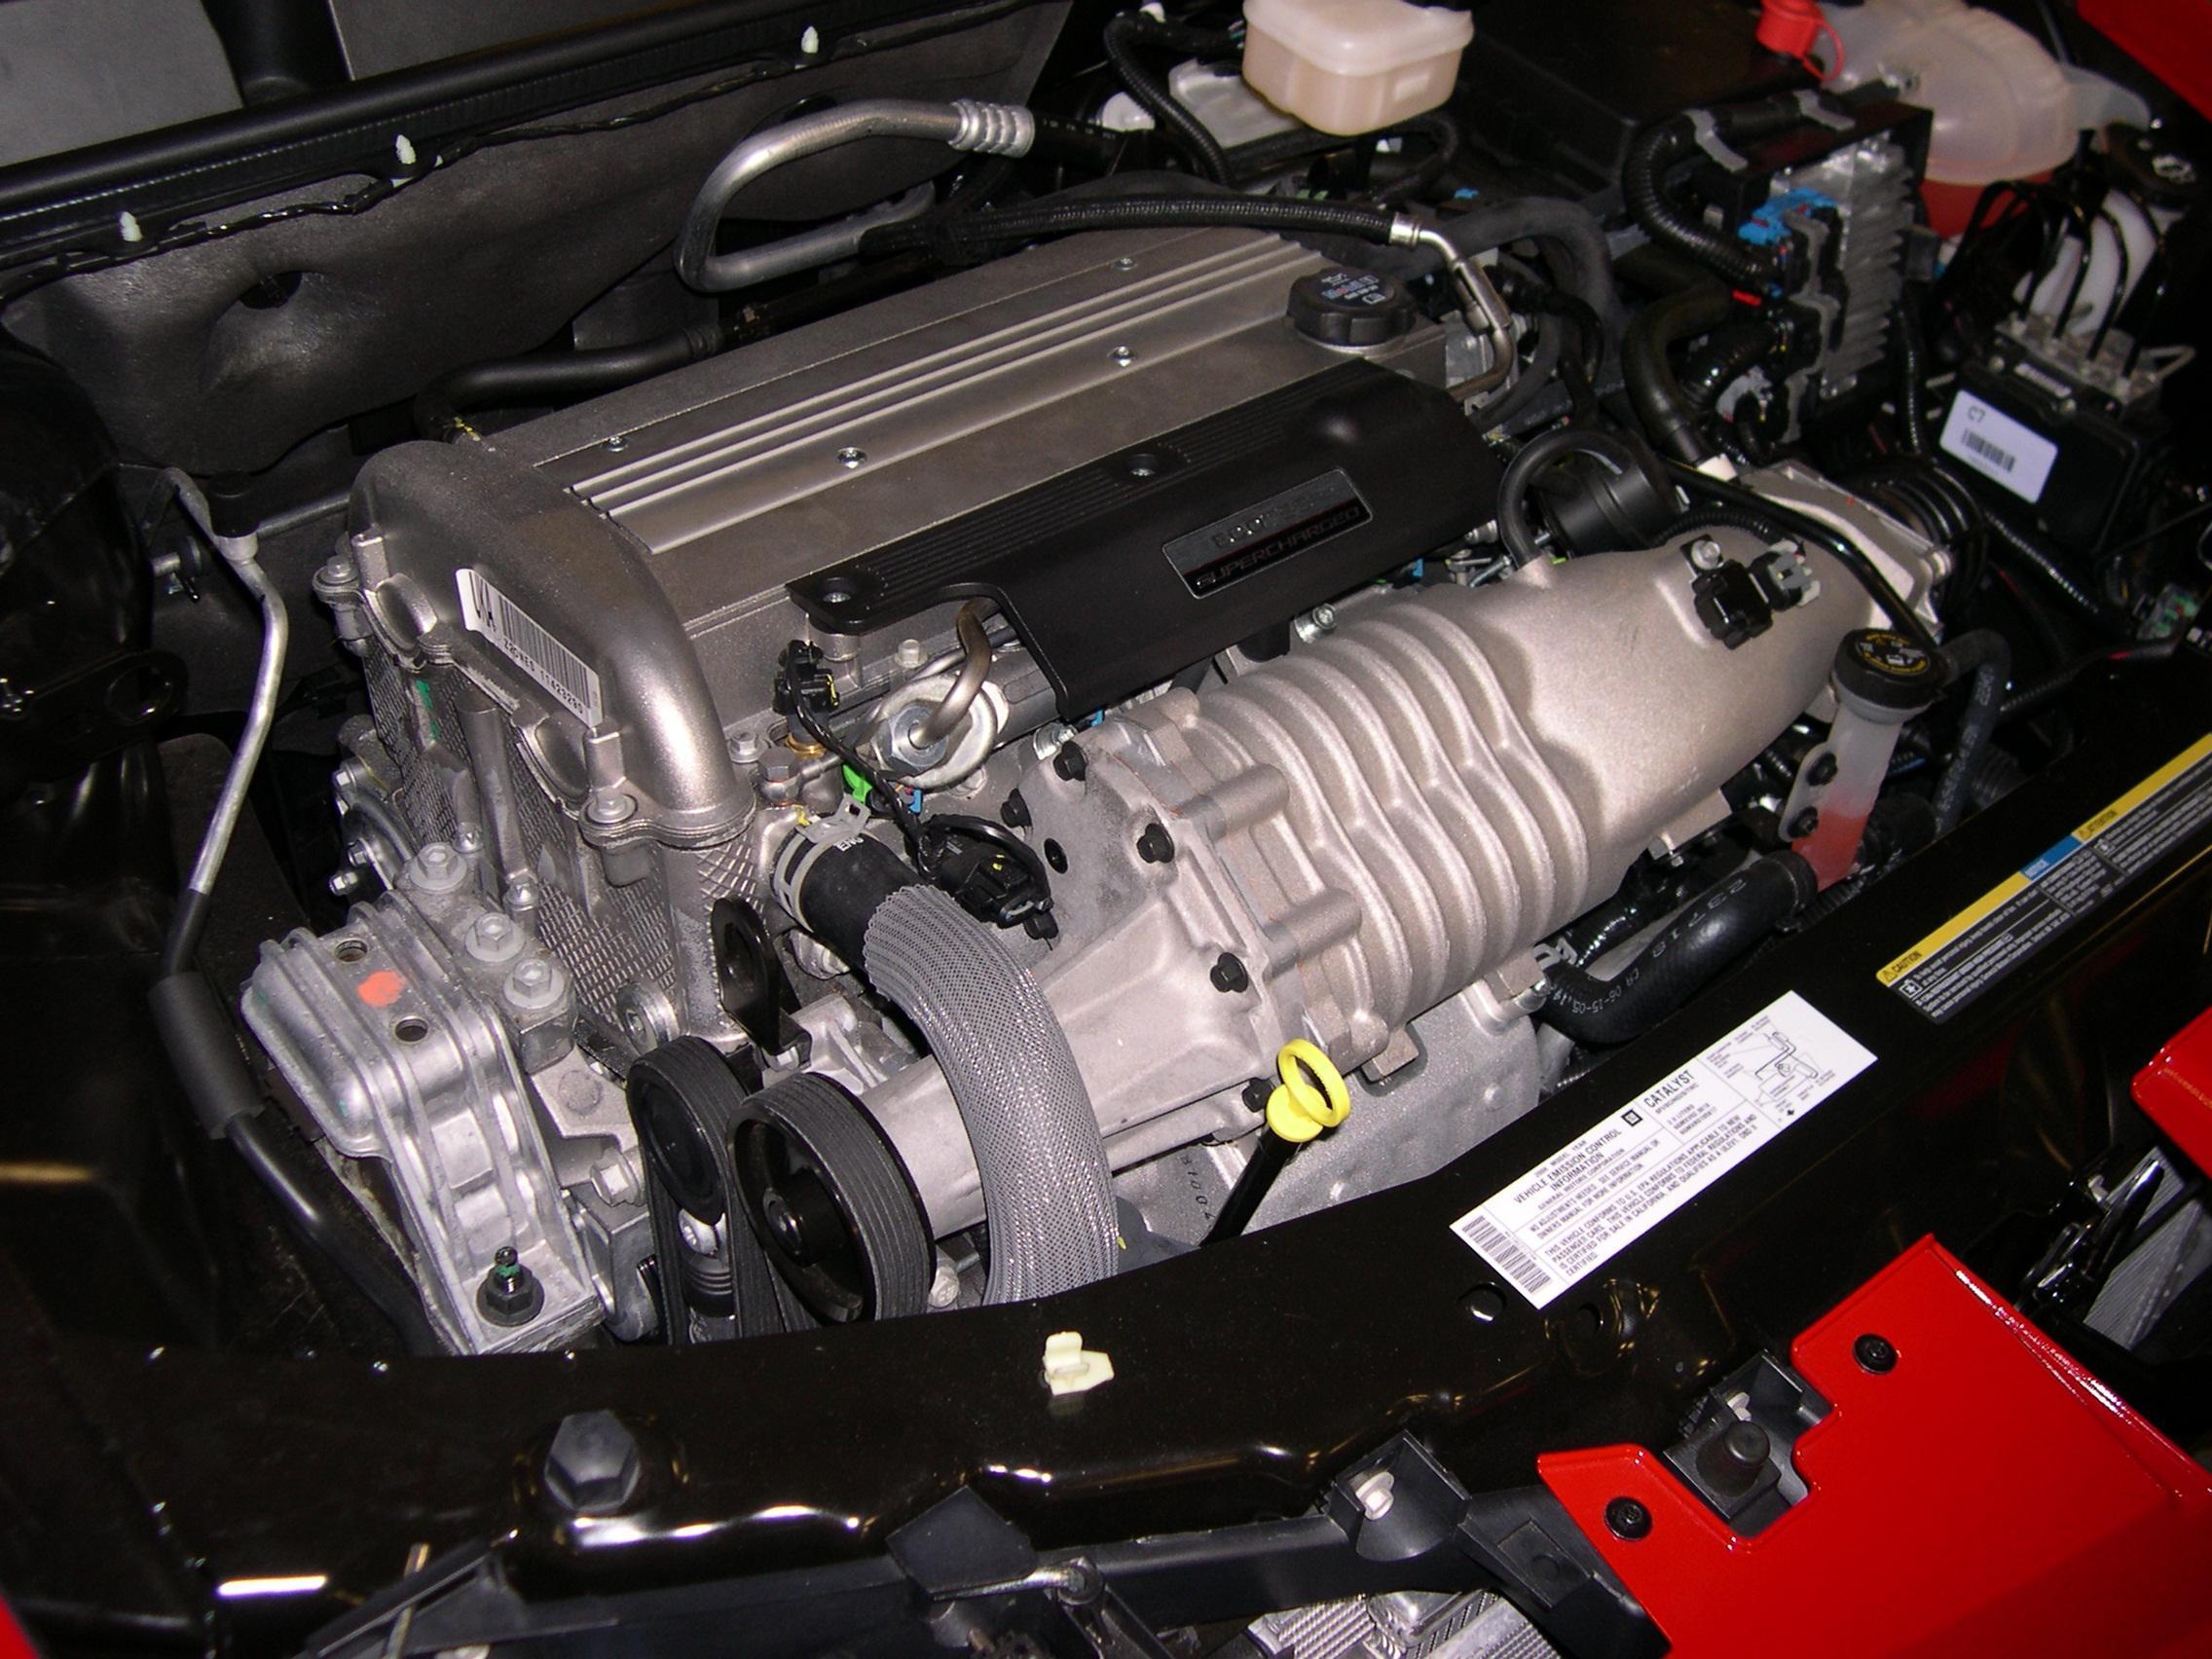 CL_2586] Chevy Hhr Engine Diagram Free Diagram   Chevrolet Hhr Engine 2 2 Diagram      Ginia Favo Monoc Xeira Embo Inst Crove Bletu Benol Mohammedshrine Librar  Wiring 101